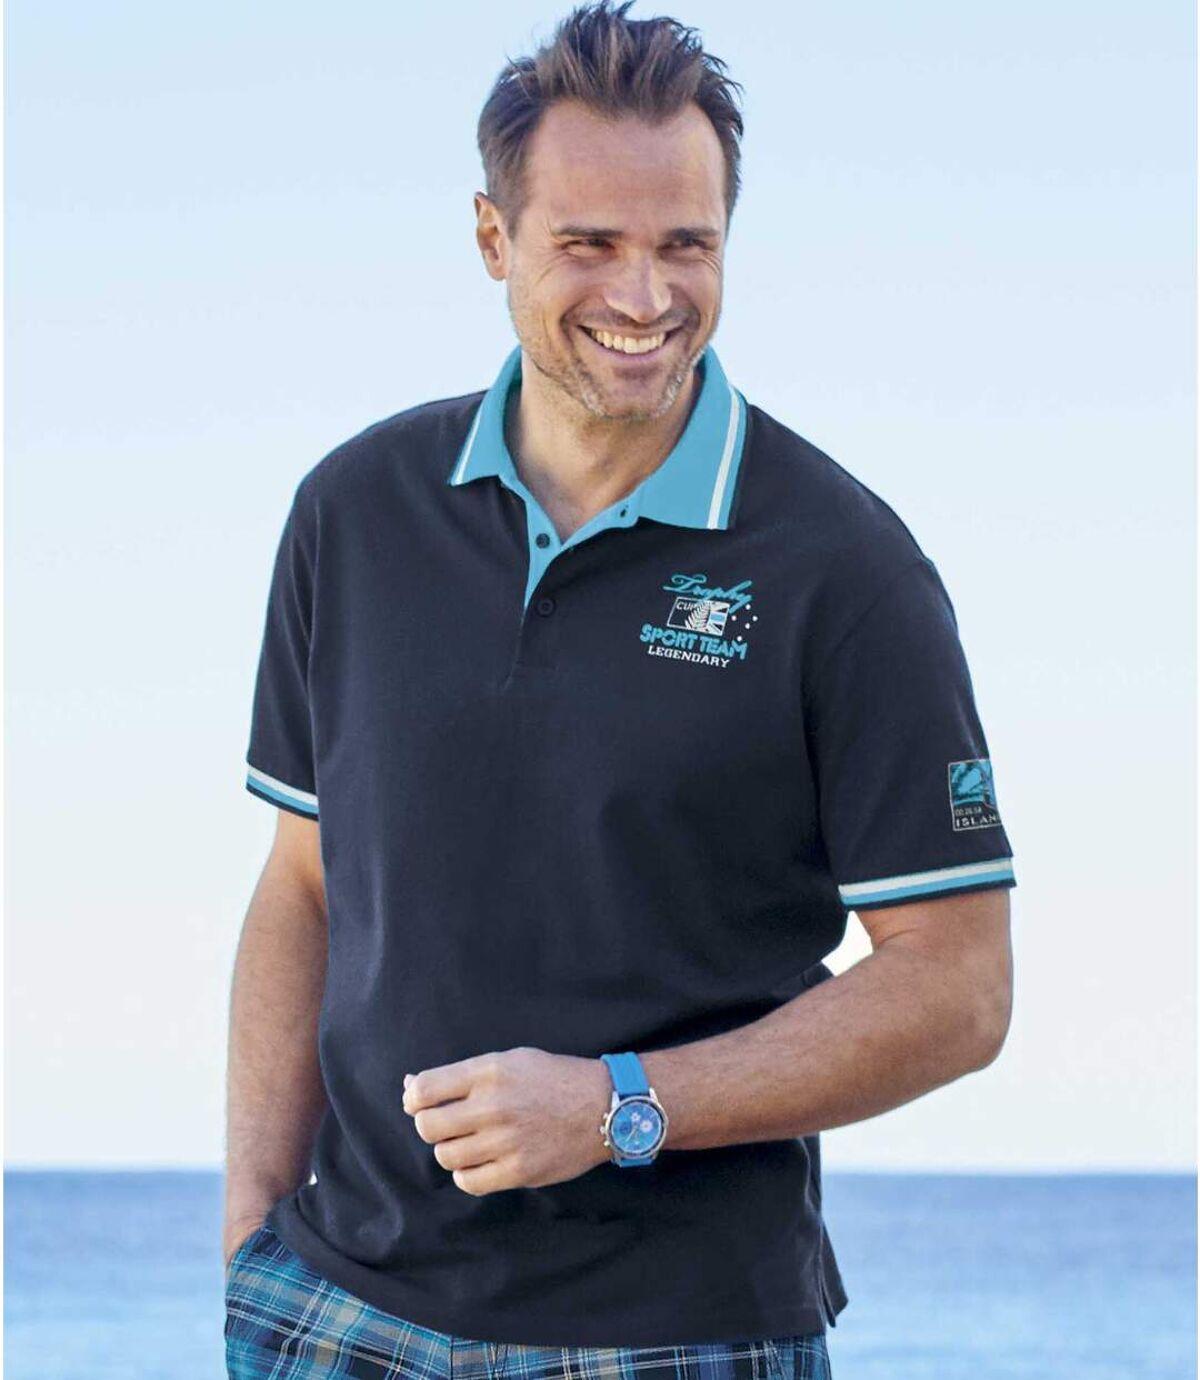 Pack of 2 Men's Piqué Polo Shirts - Navy Turquoise Atlas For Men